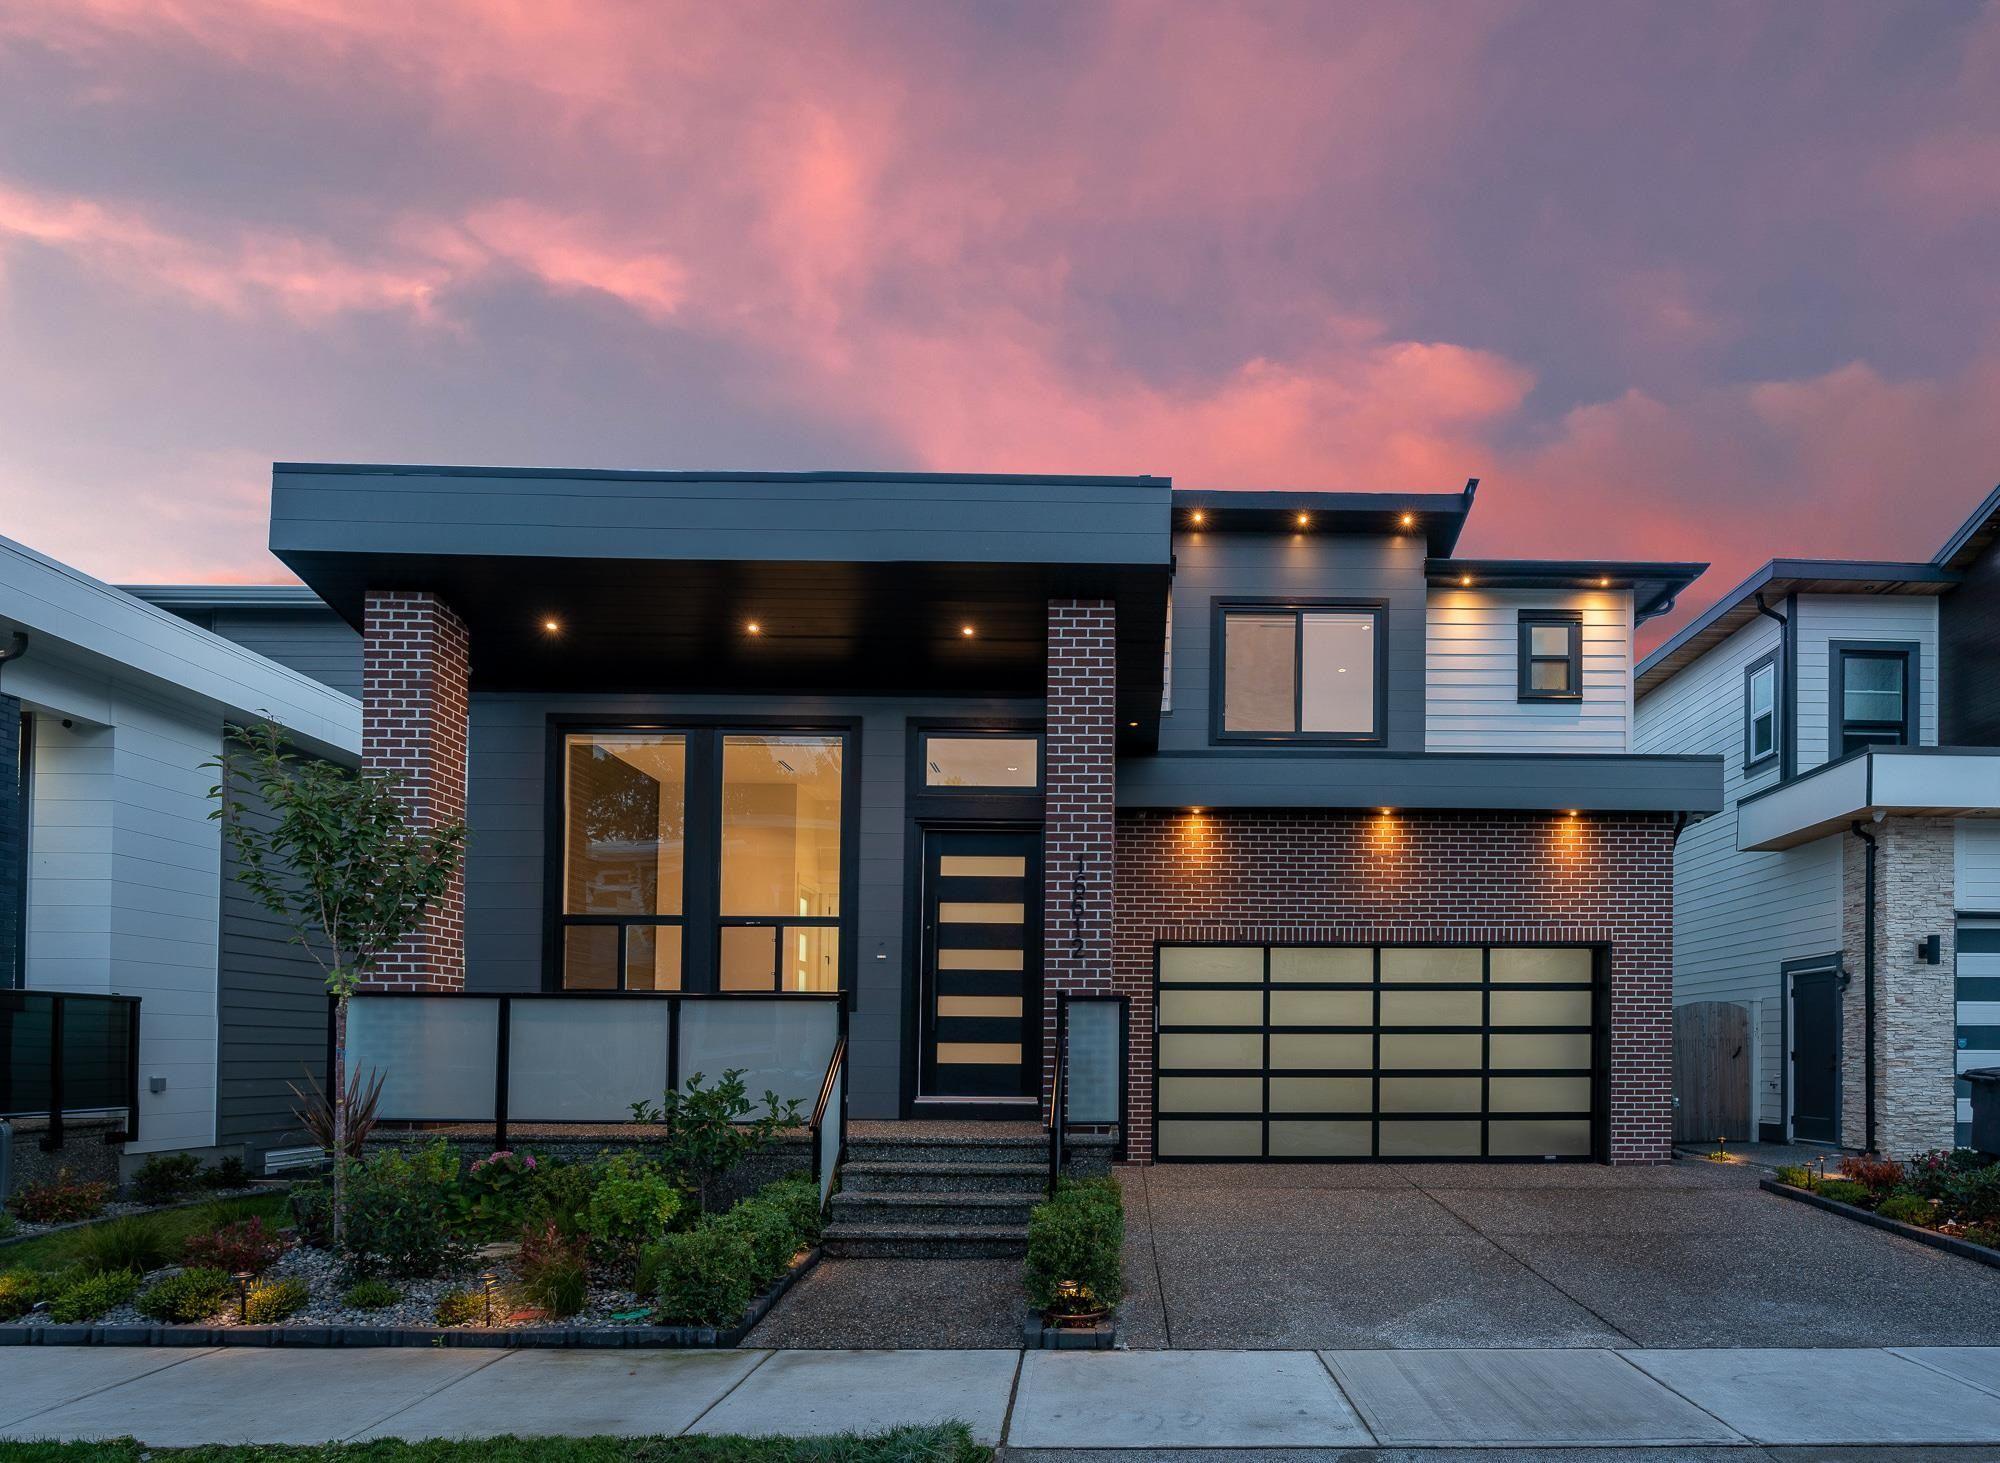 Main Photo: 16612 18B Avenue in Surrey: Pacific Douglas House for sale (South Surrey White Rock)  : MLS®# R2621481